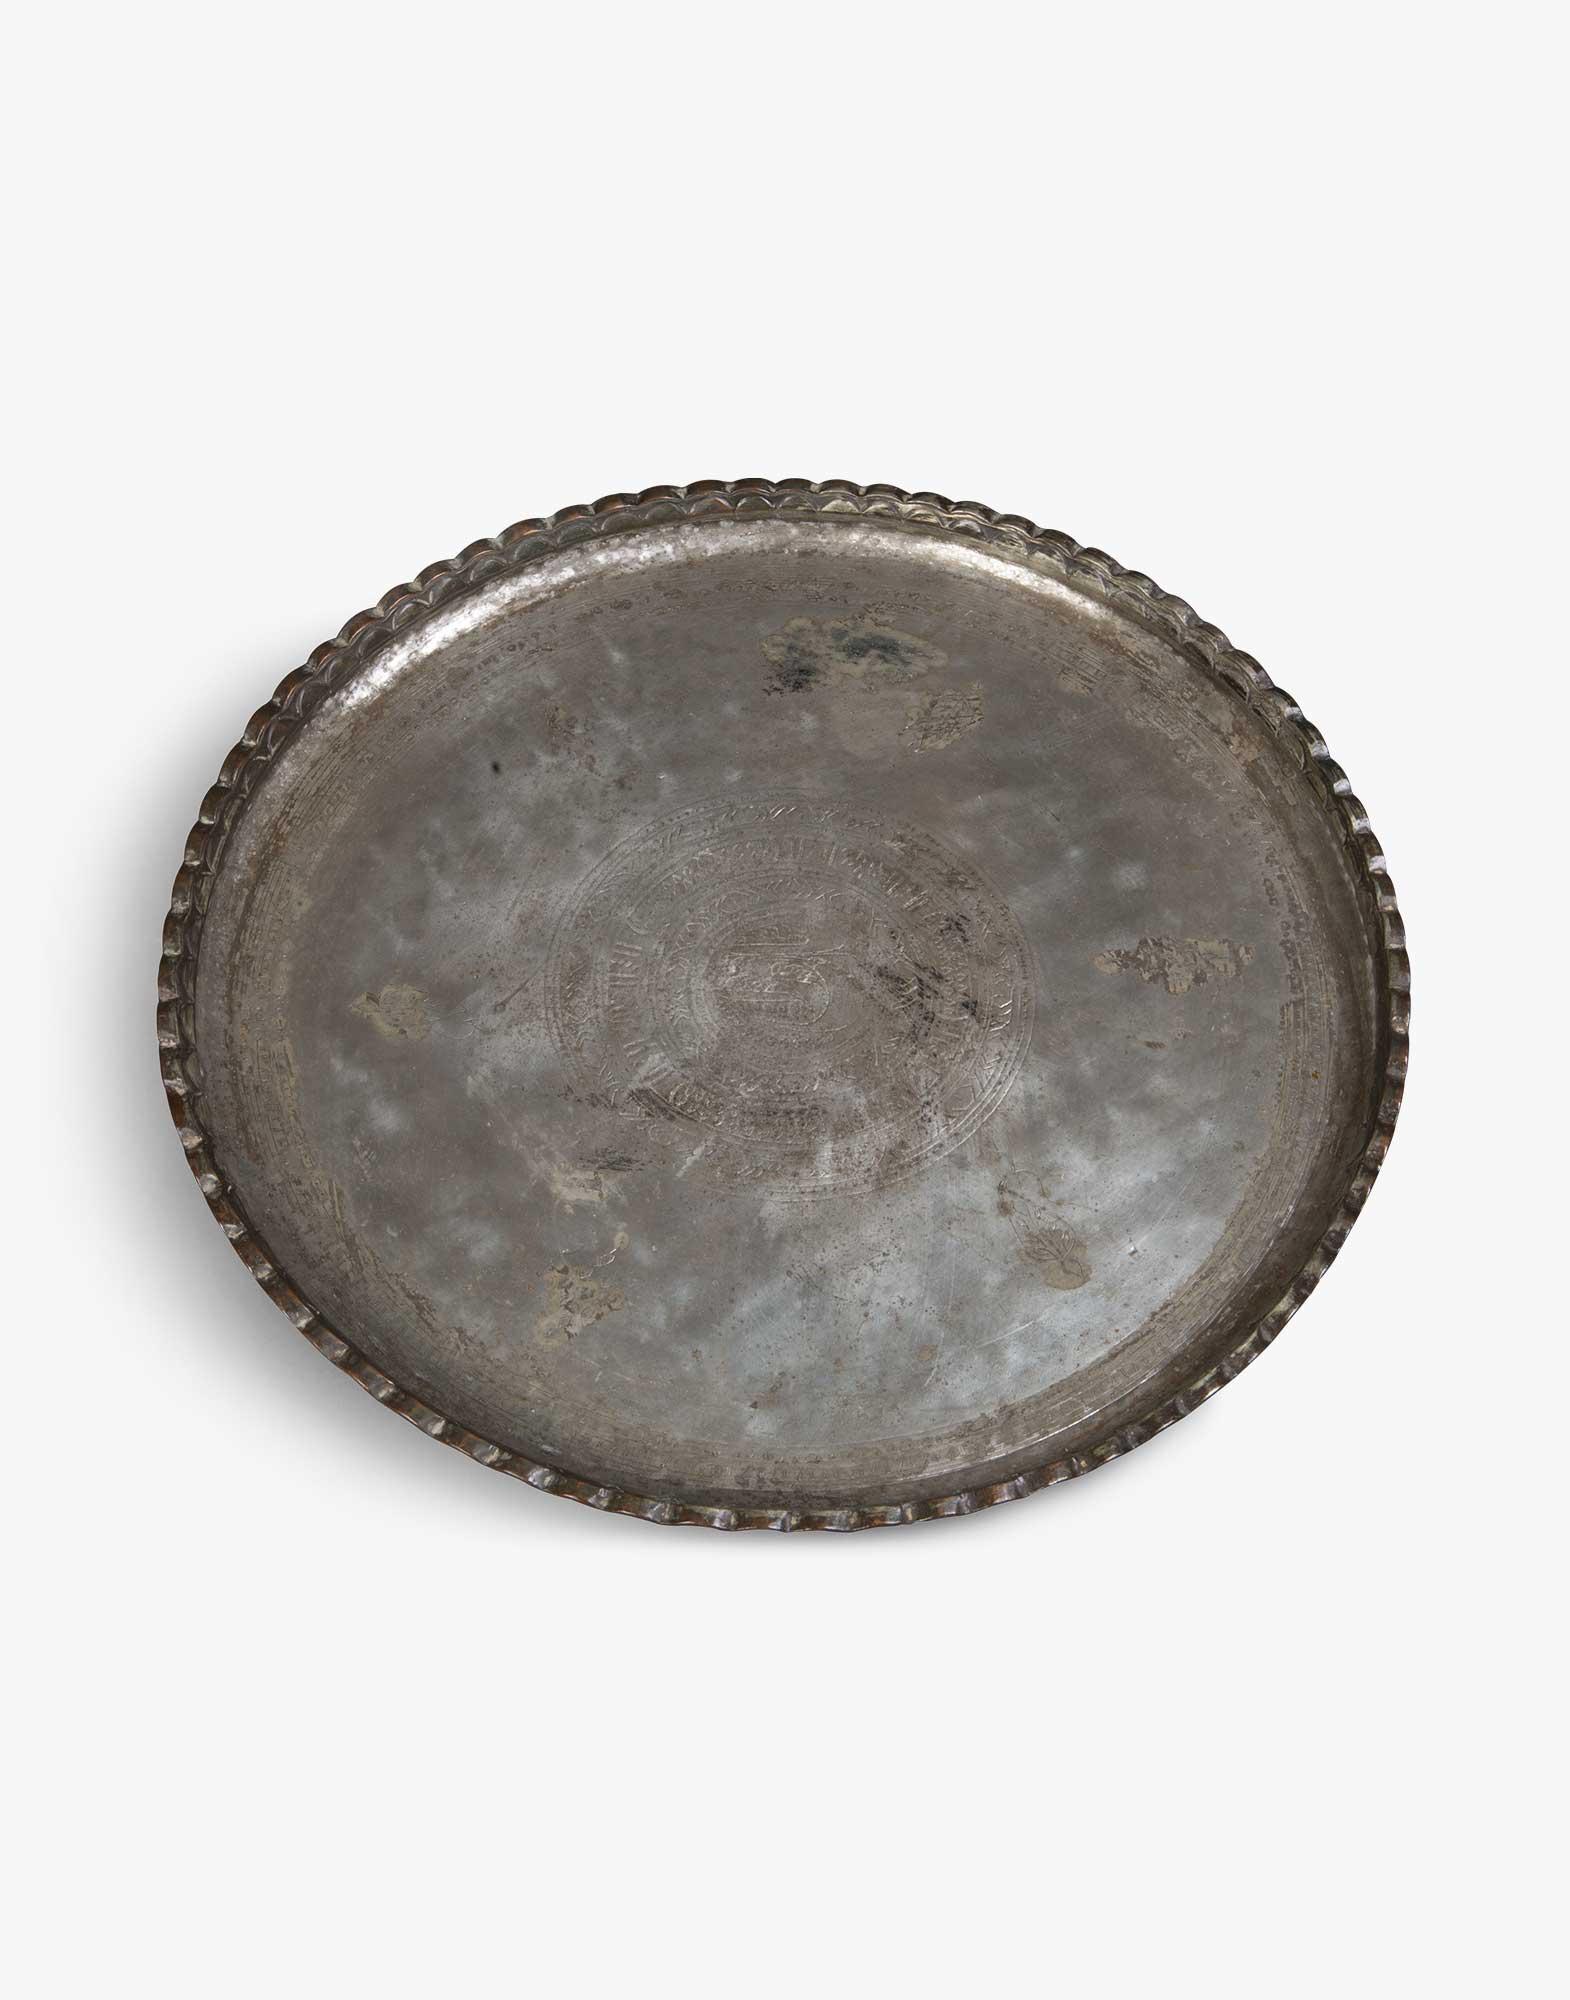 Antique Sini Serving Tray